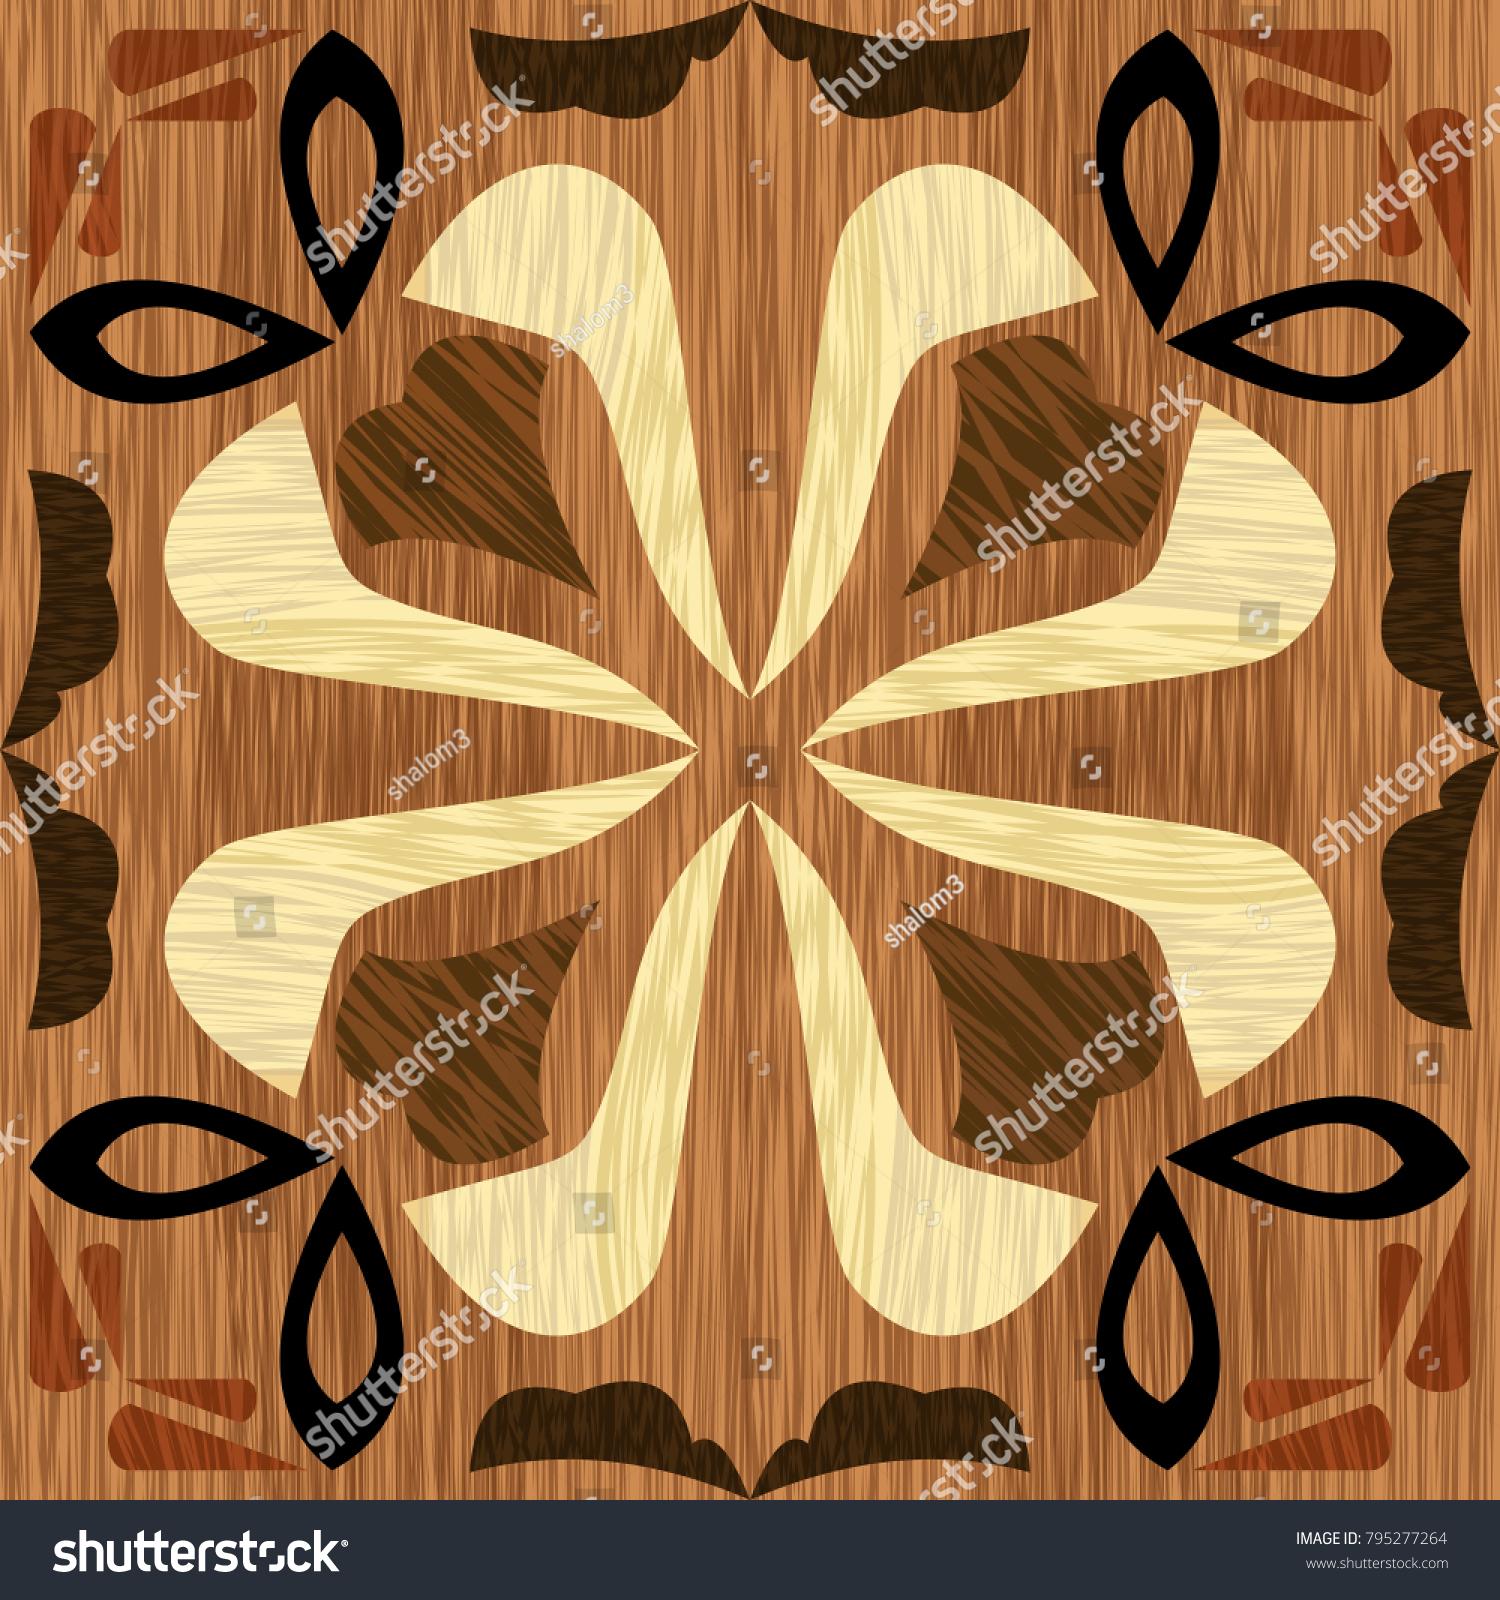 Wood Art Inlay Tile Geometric Ornament Stock Vector 795277264 ...